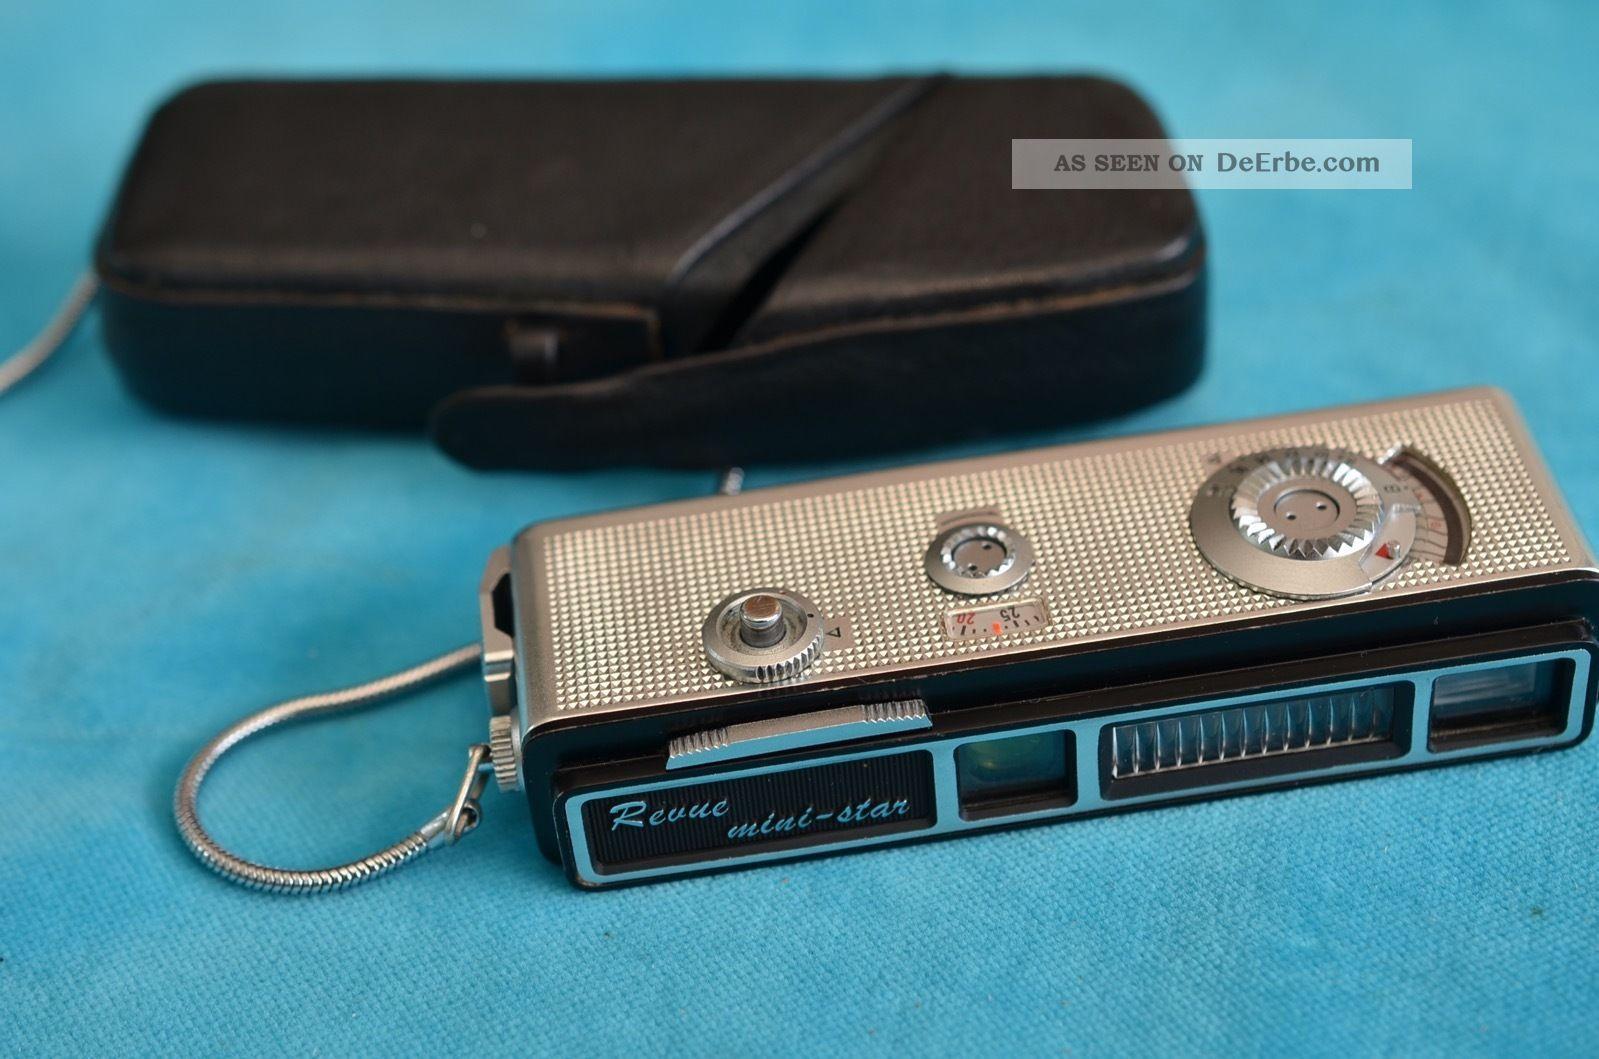 Sammlerstück Alte Pocketkamera Miniaturkamera Revue Mini - Star Mit Lederetui Photographica Bild